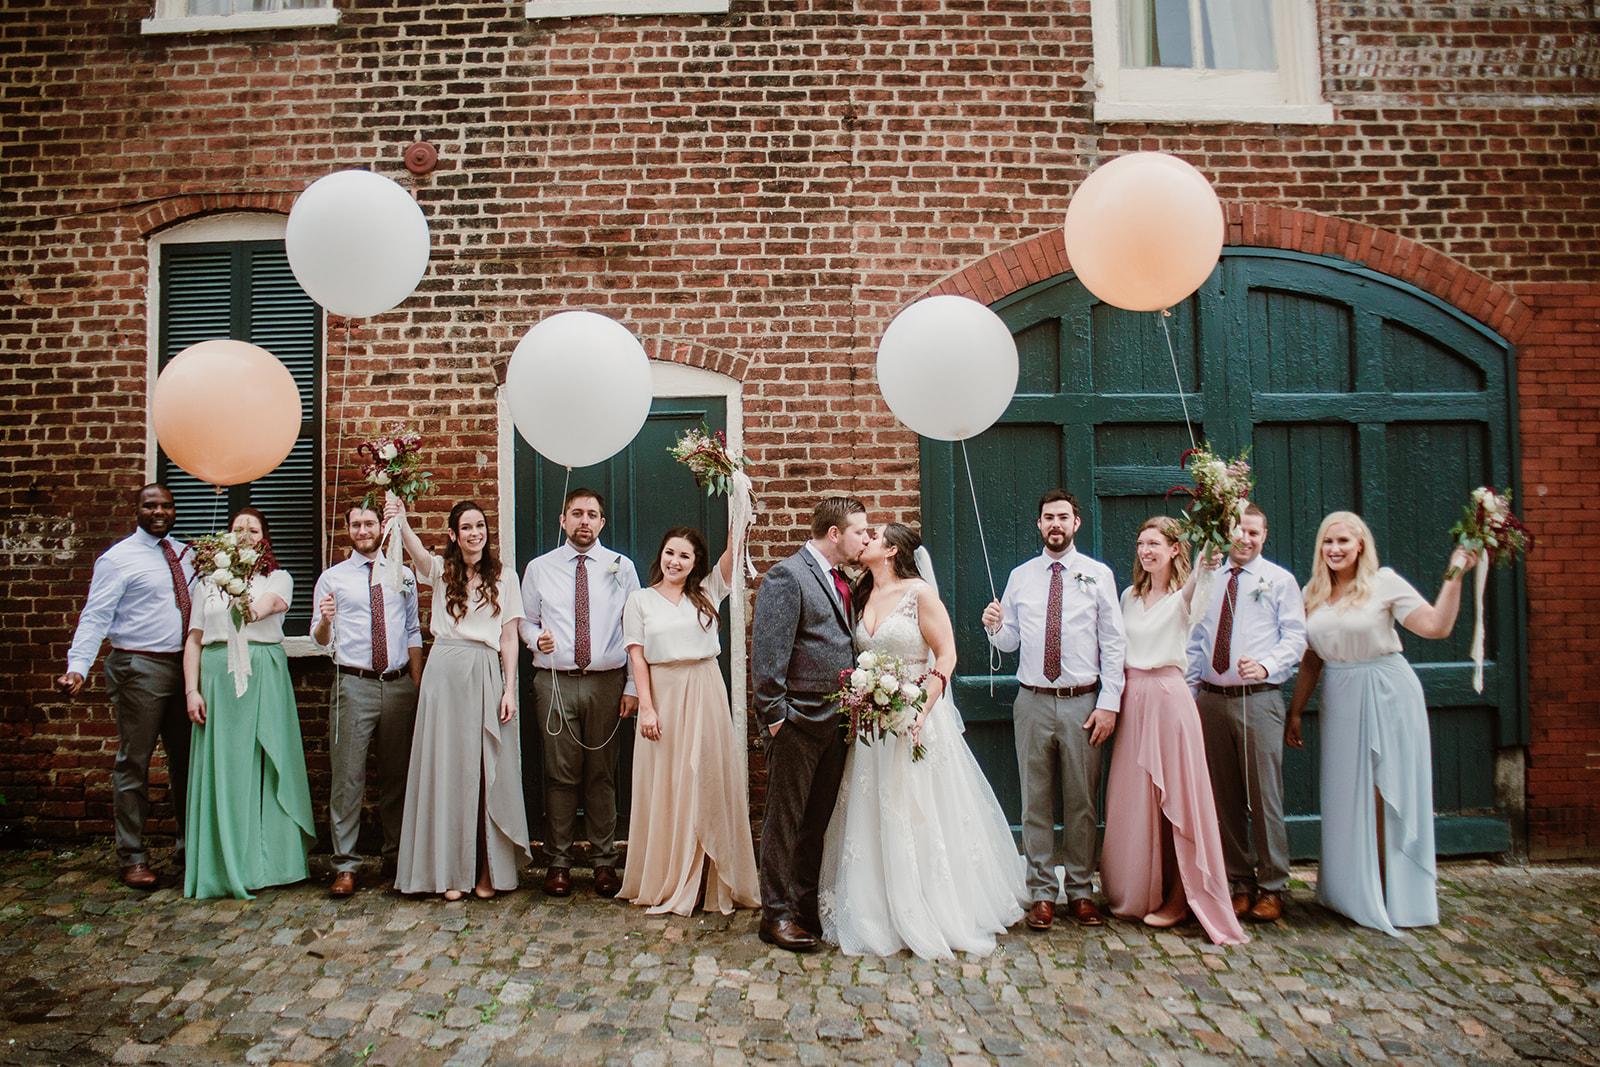 SarahMattozziPhotography-EmilyColin-LindenRowInnWedding-WeddingParty-9.jpg